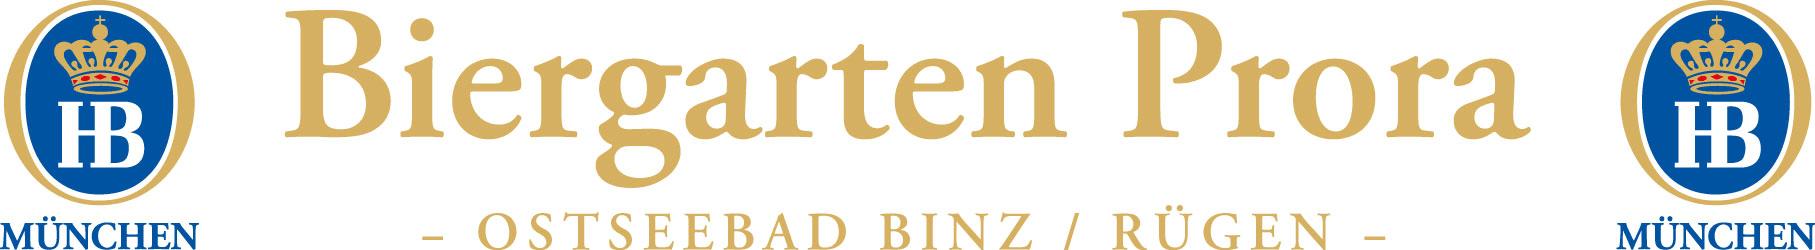 Logo Biergarten Prora